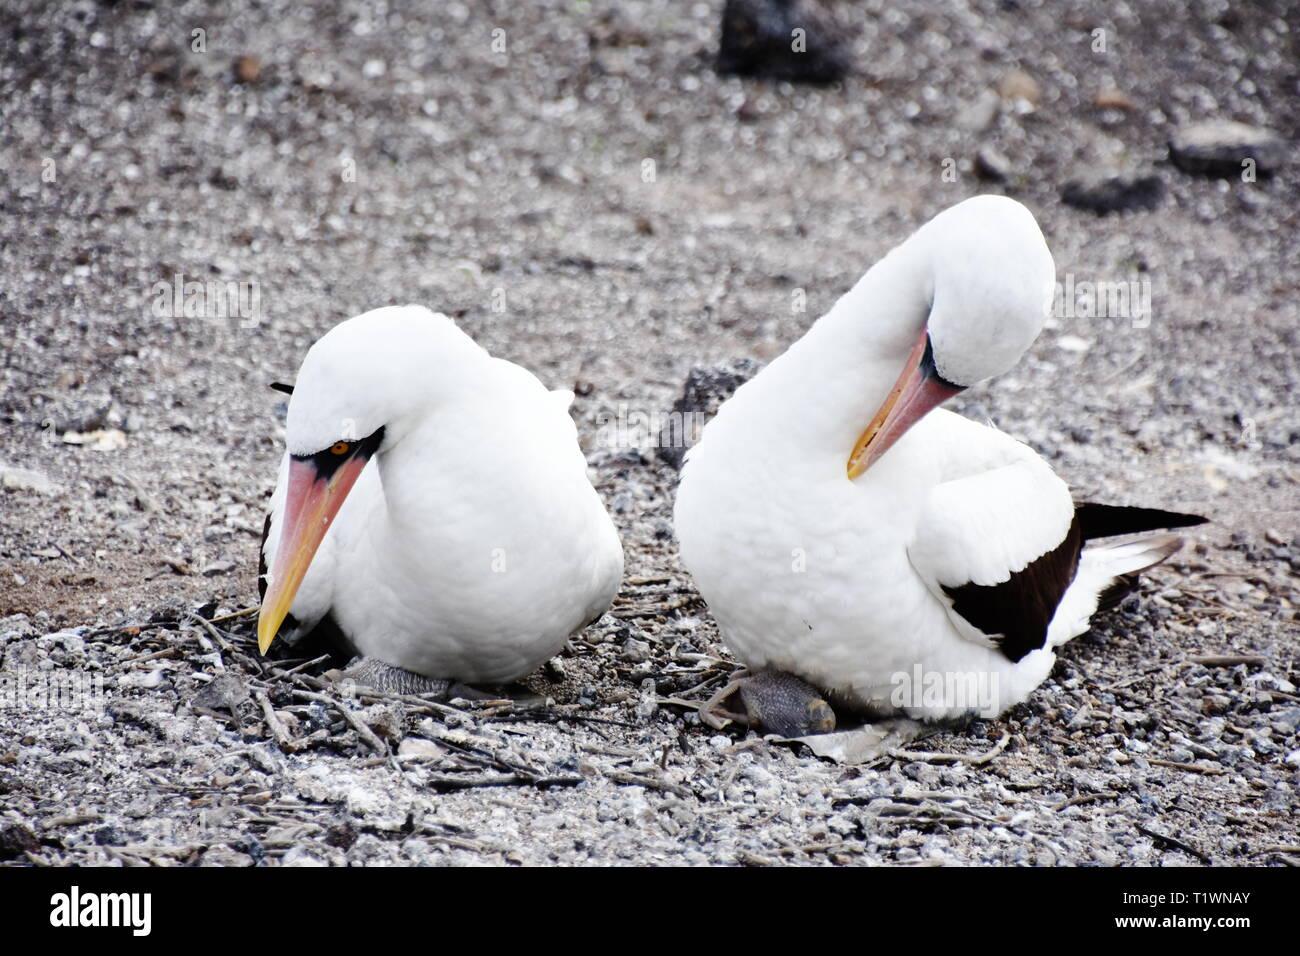 Nazca booby bird Sula granti couple sitting in the nest warming small chicken - Stock Image